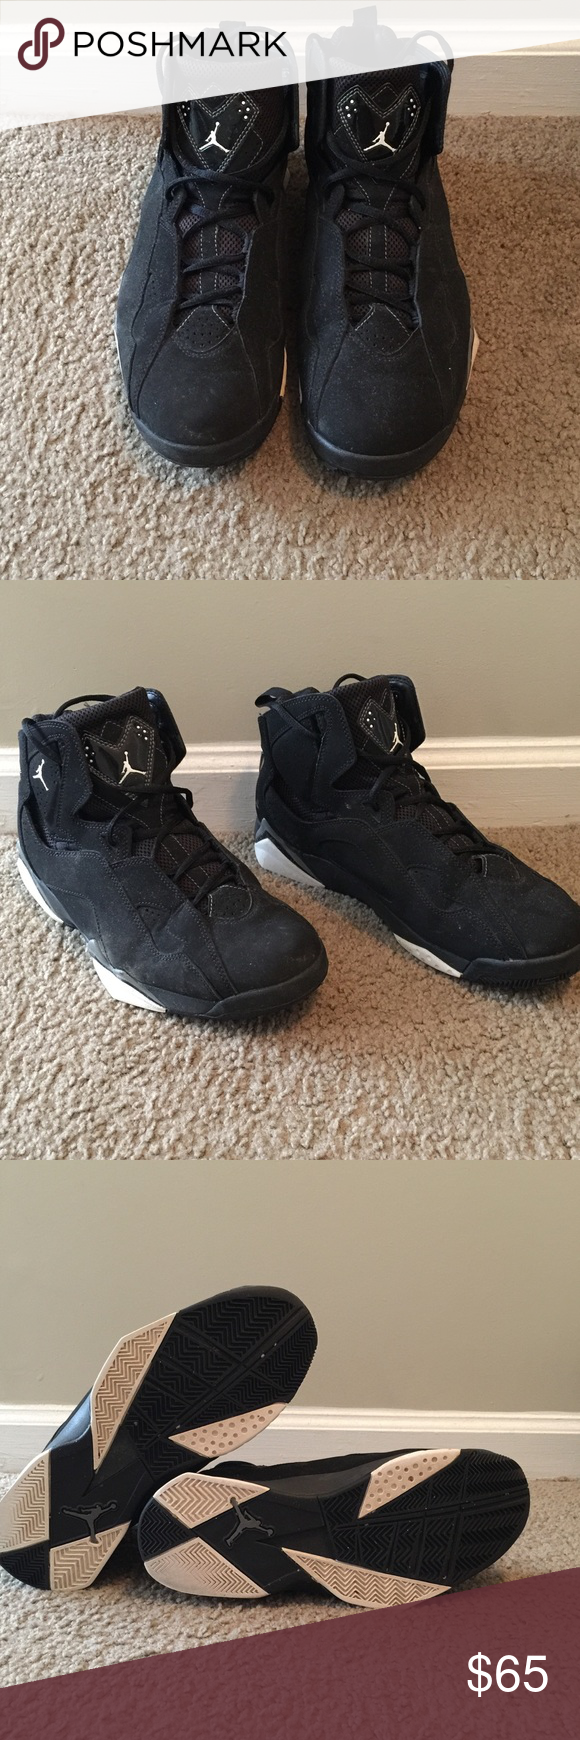 Nike Air Jordan True Flight Black/White Cool Grey 342964-010 Size 11 With Box!!